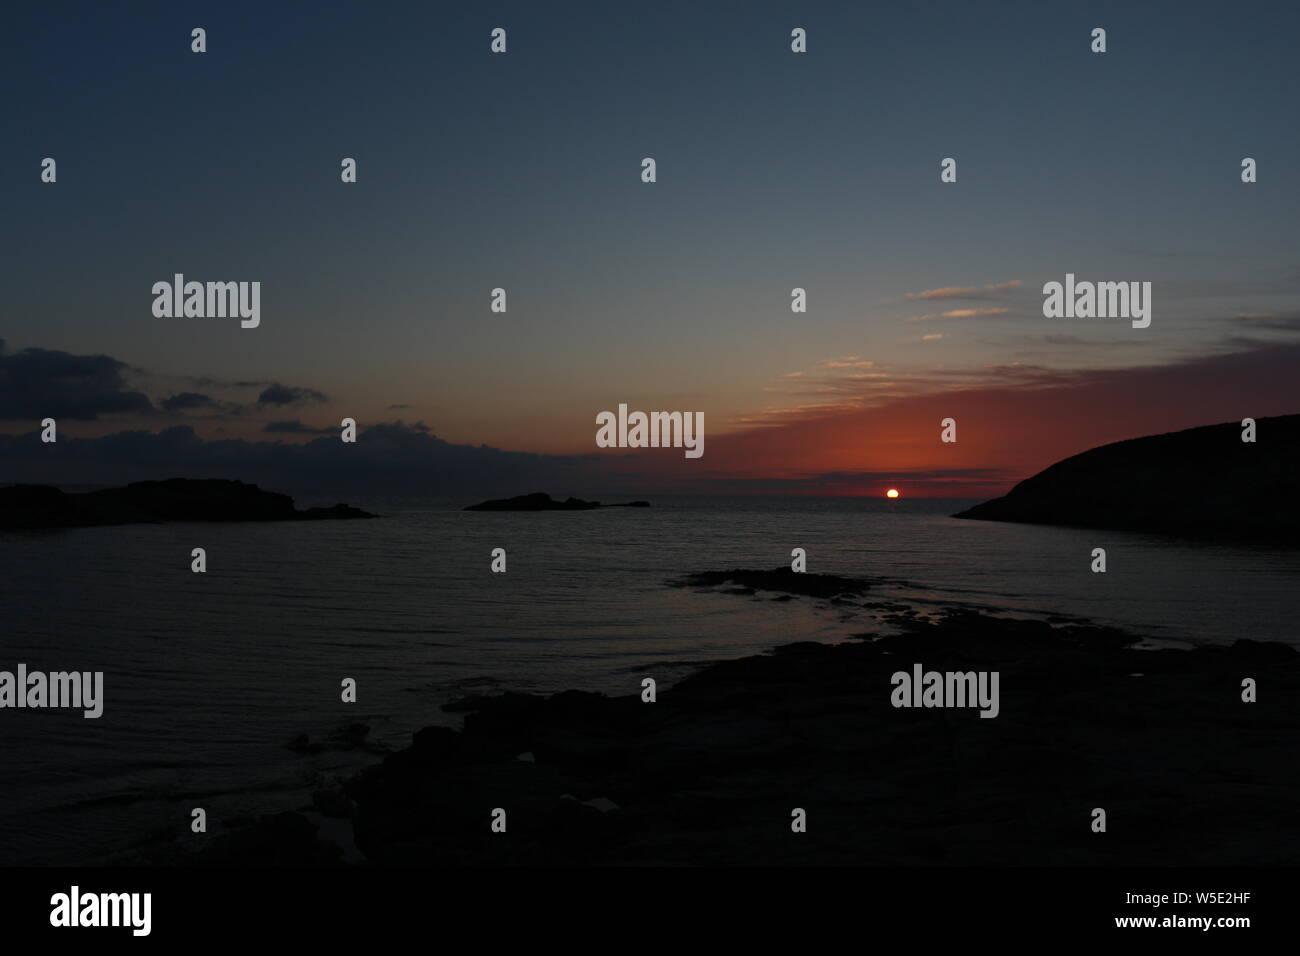 Claudy Sunset Stock Photo